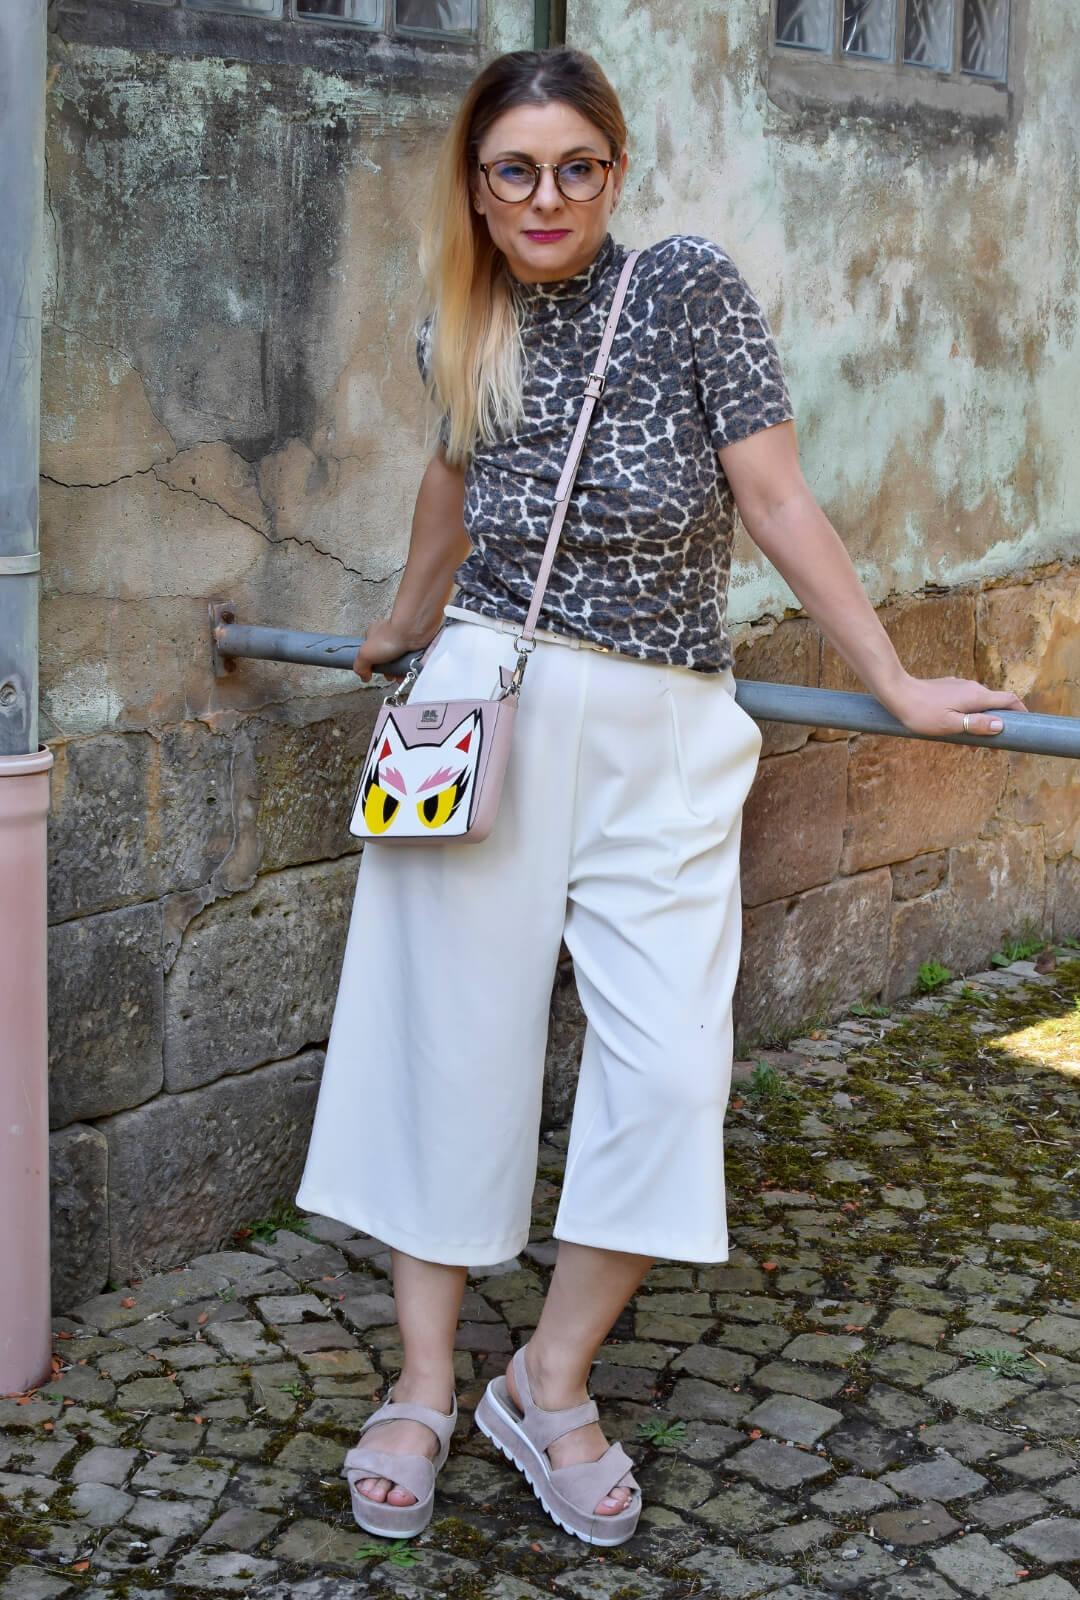 Weisse-Culotte-kombinieren-Outfit